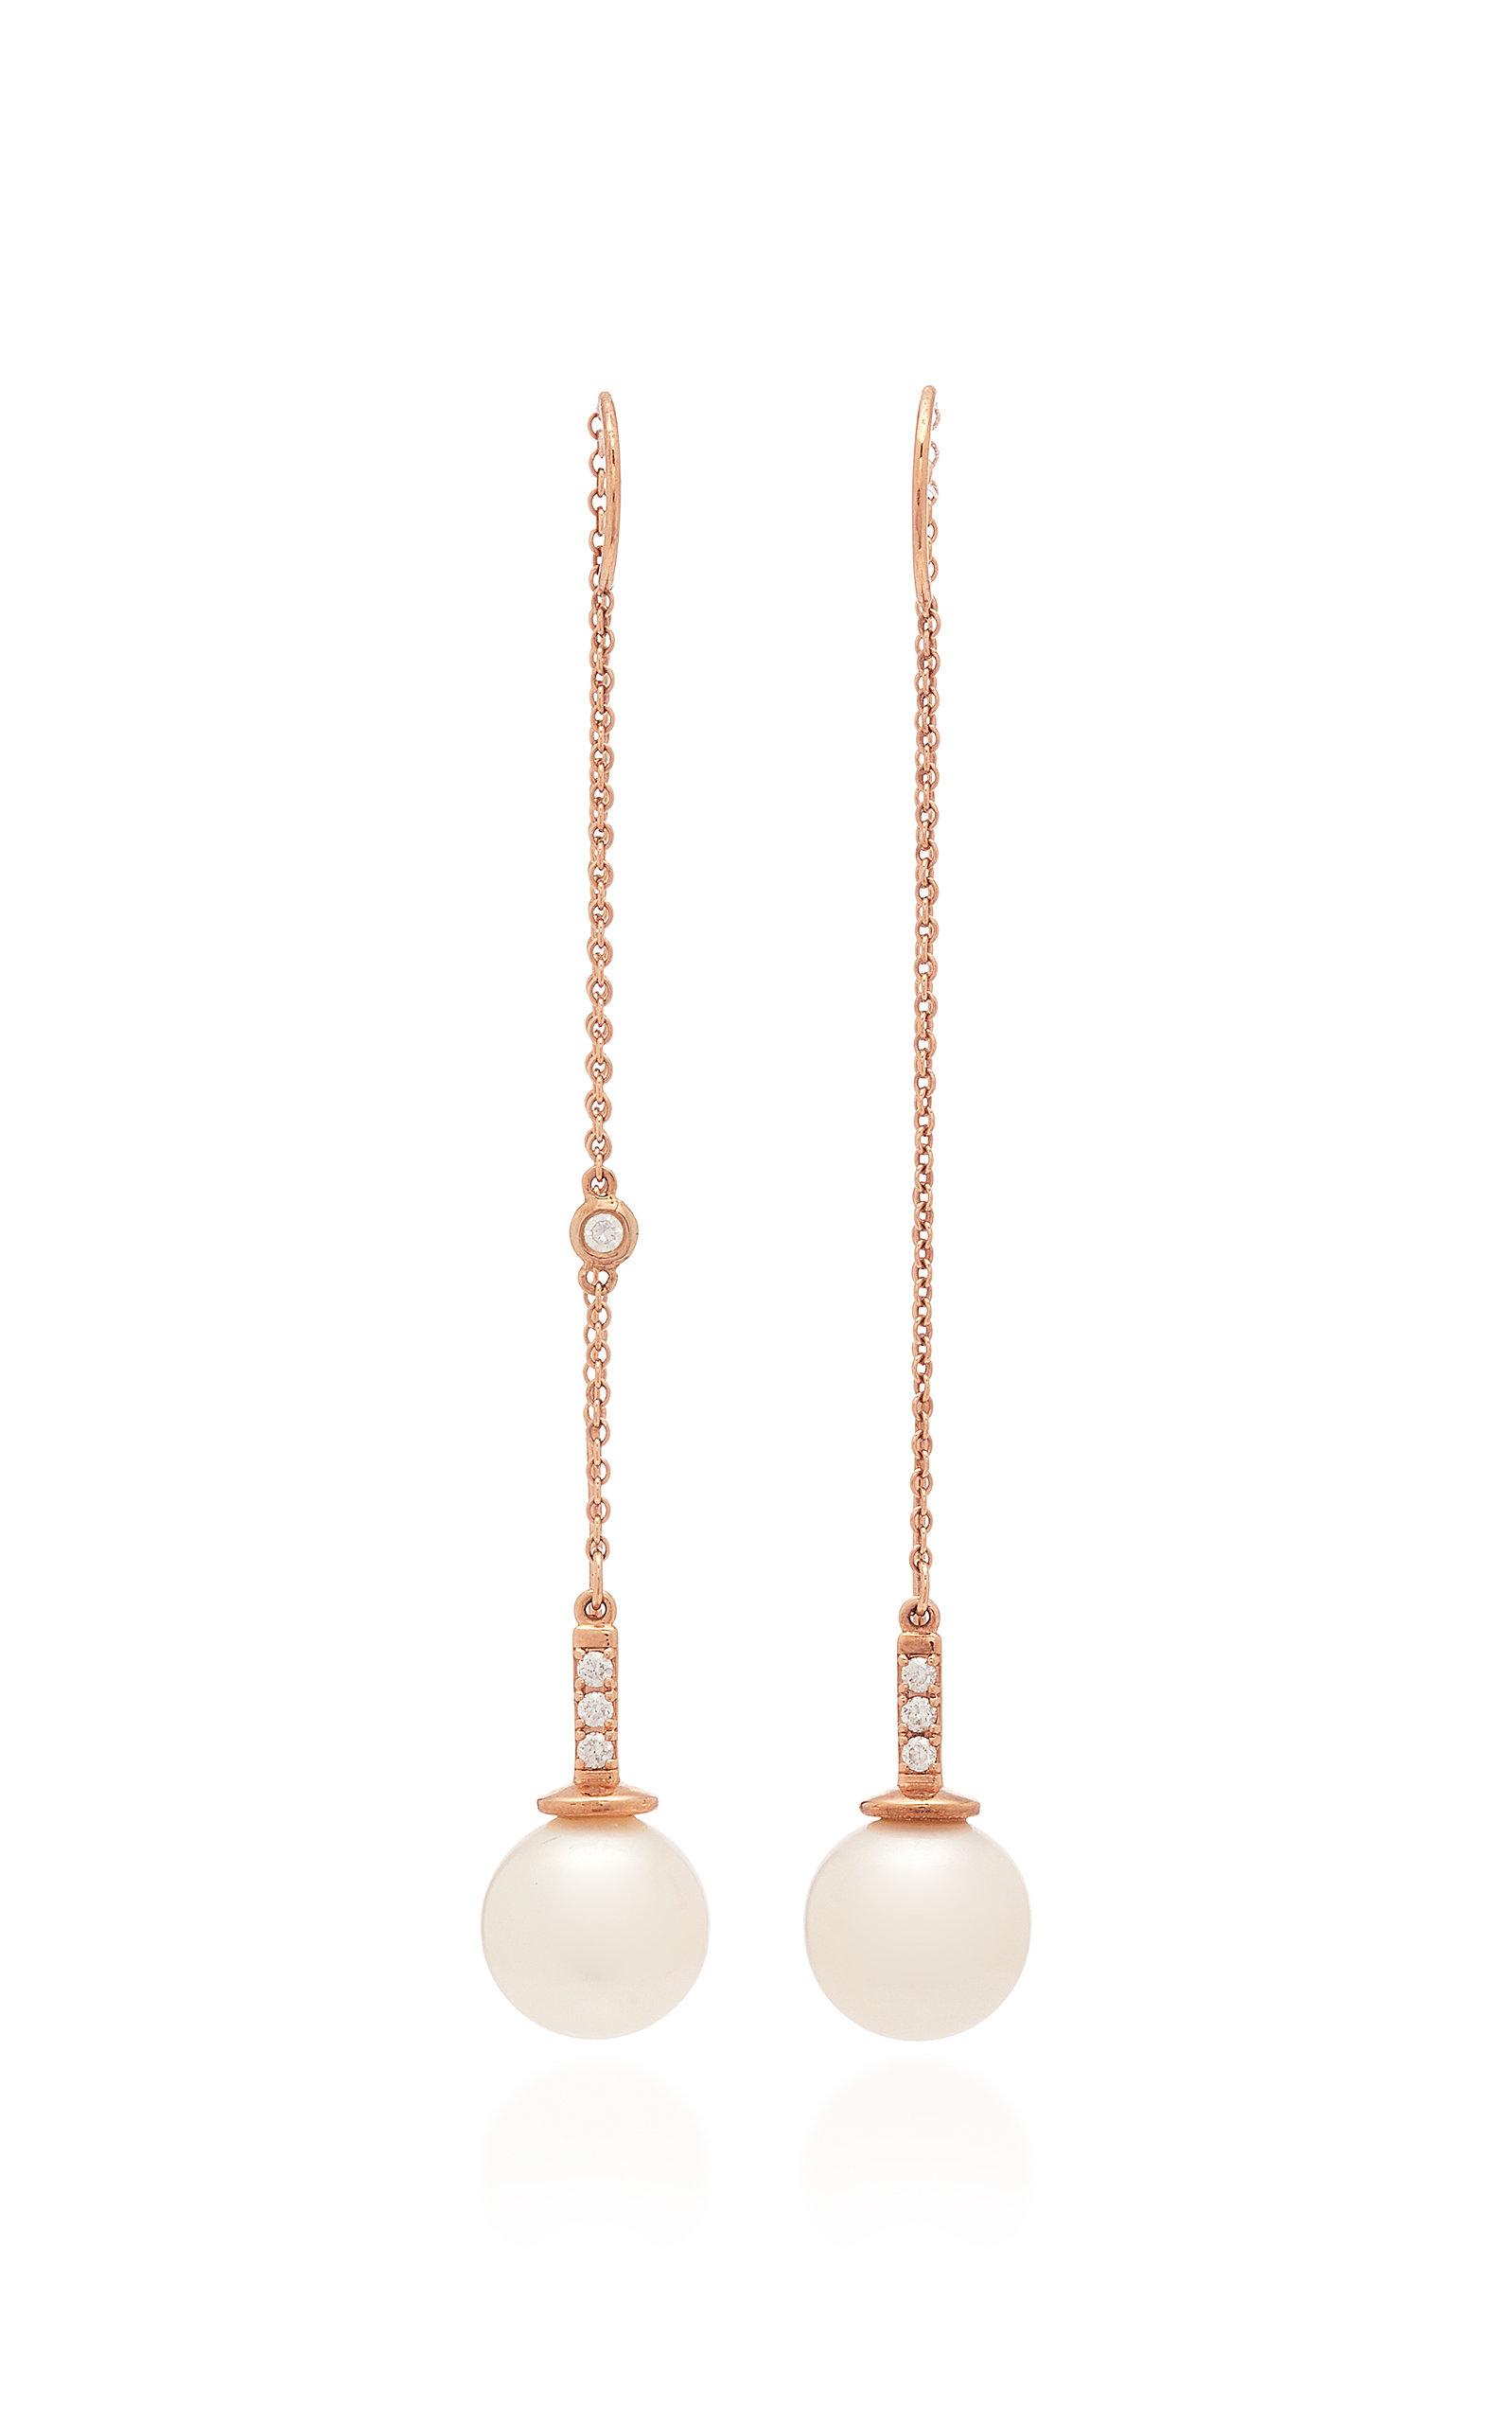 Women's 14K Gold; Diamond and Pearl Earrings